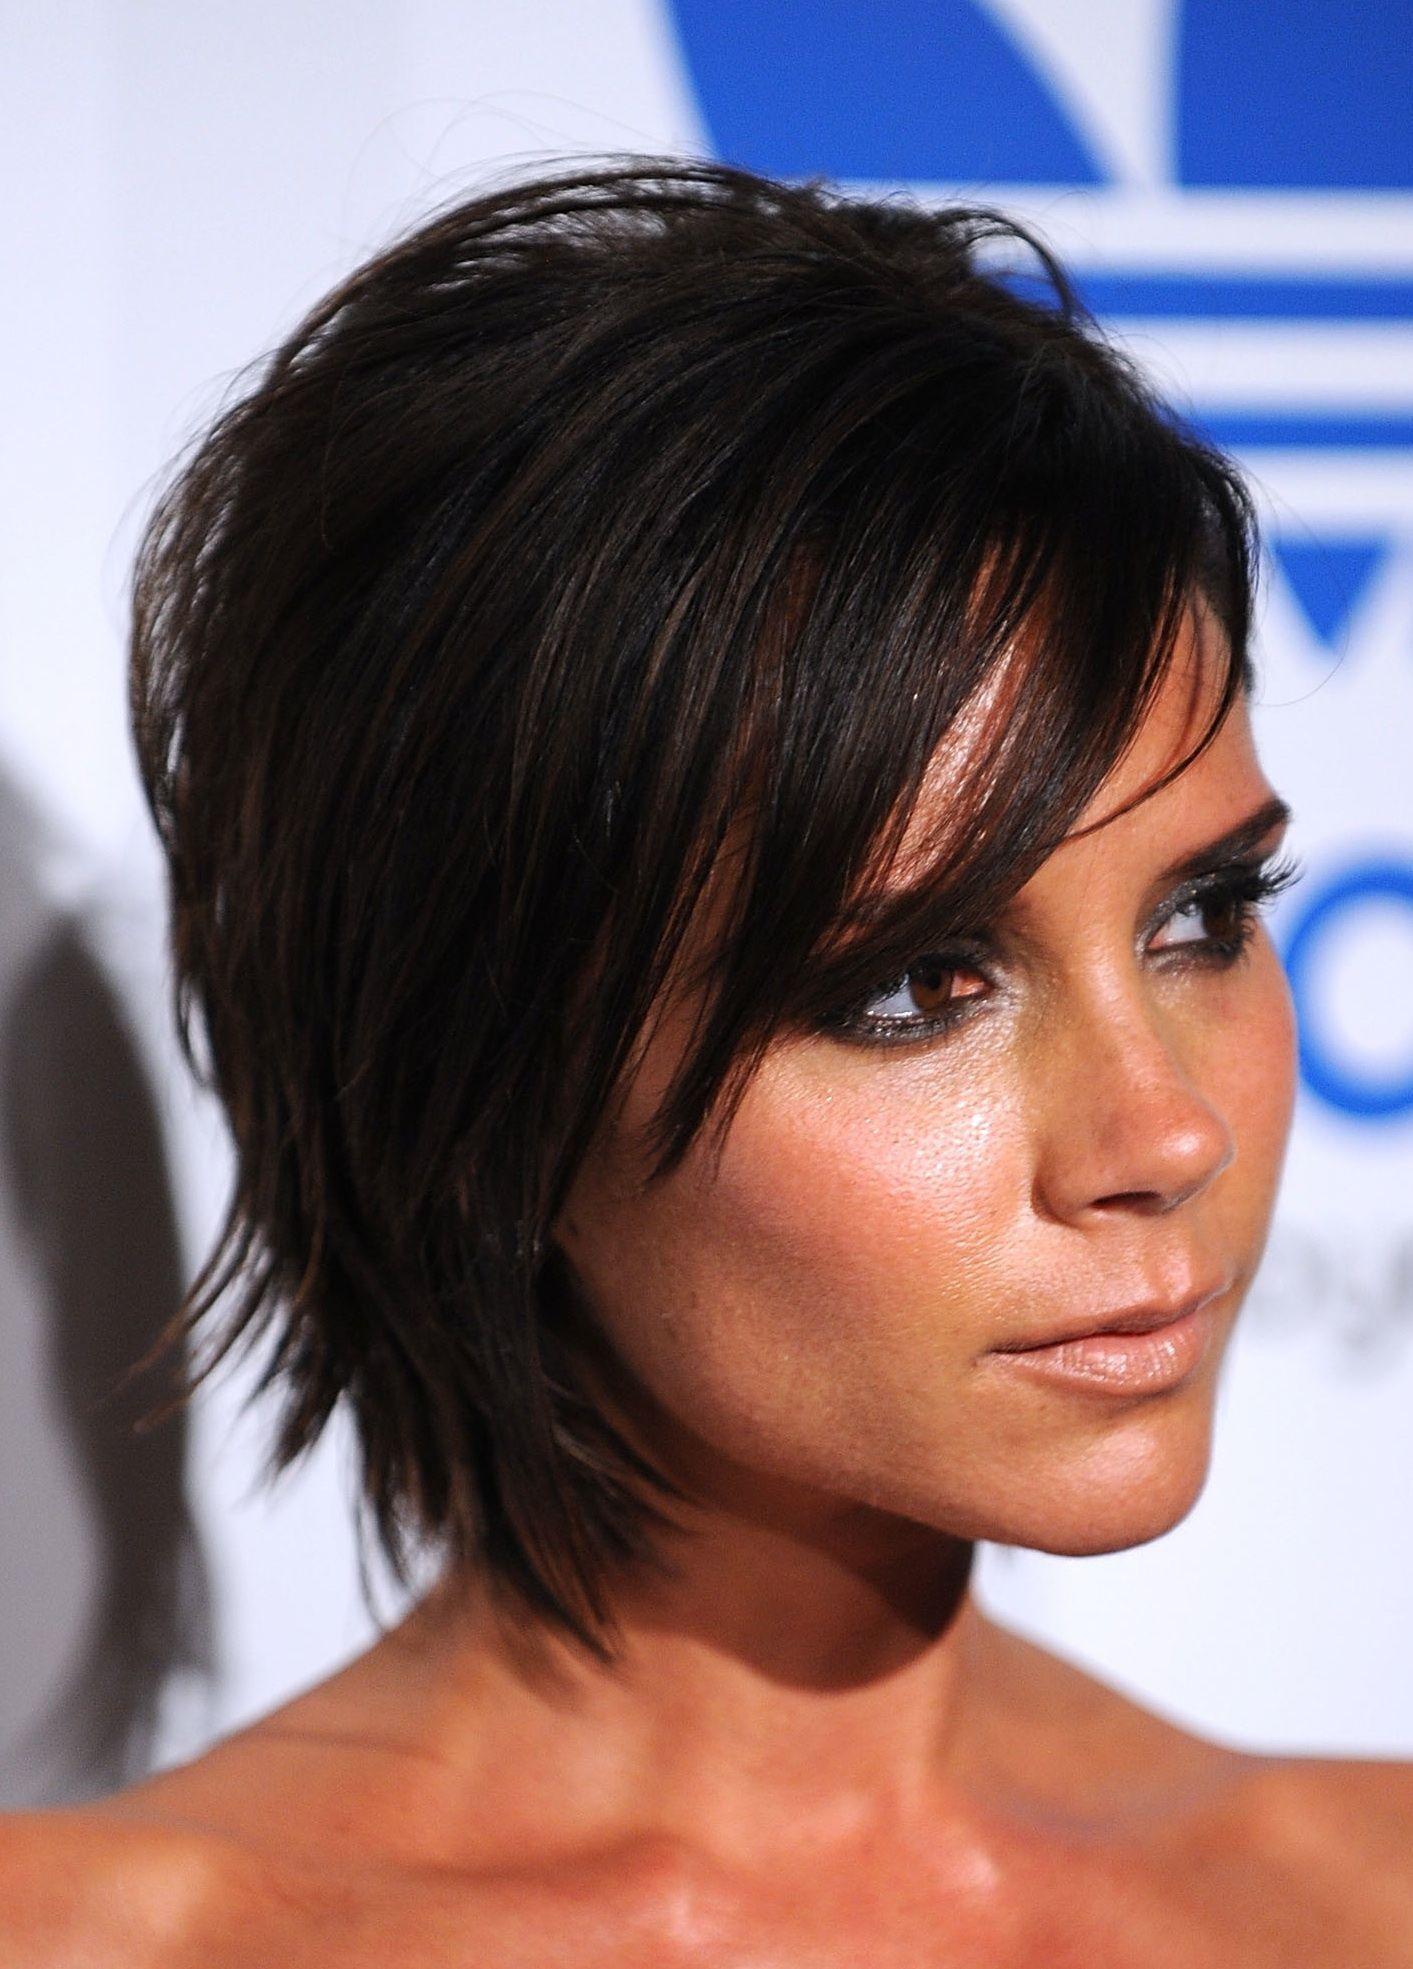 Pics photos victoria beckham bob haircut back view - Victoria Beckham Short Hairstyles Back View Yahoo Search Results